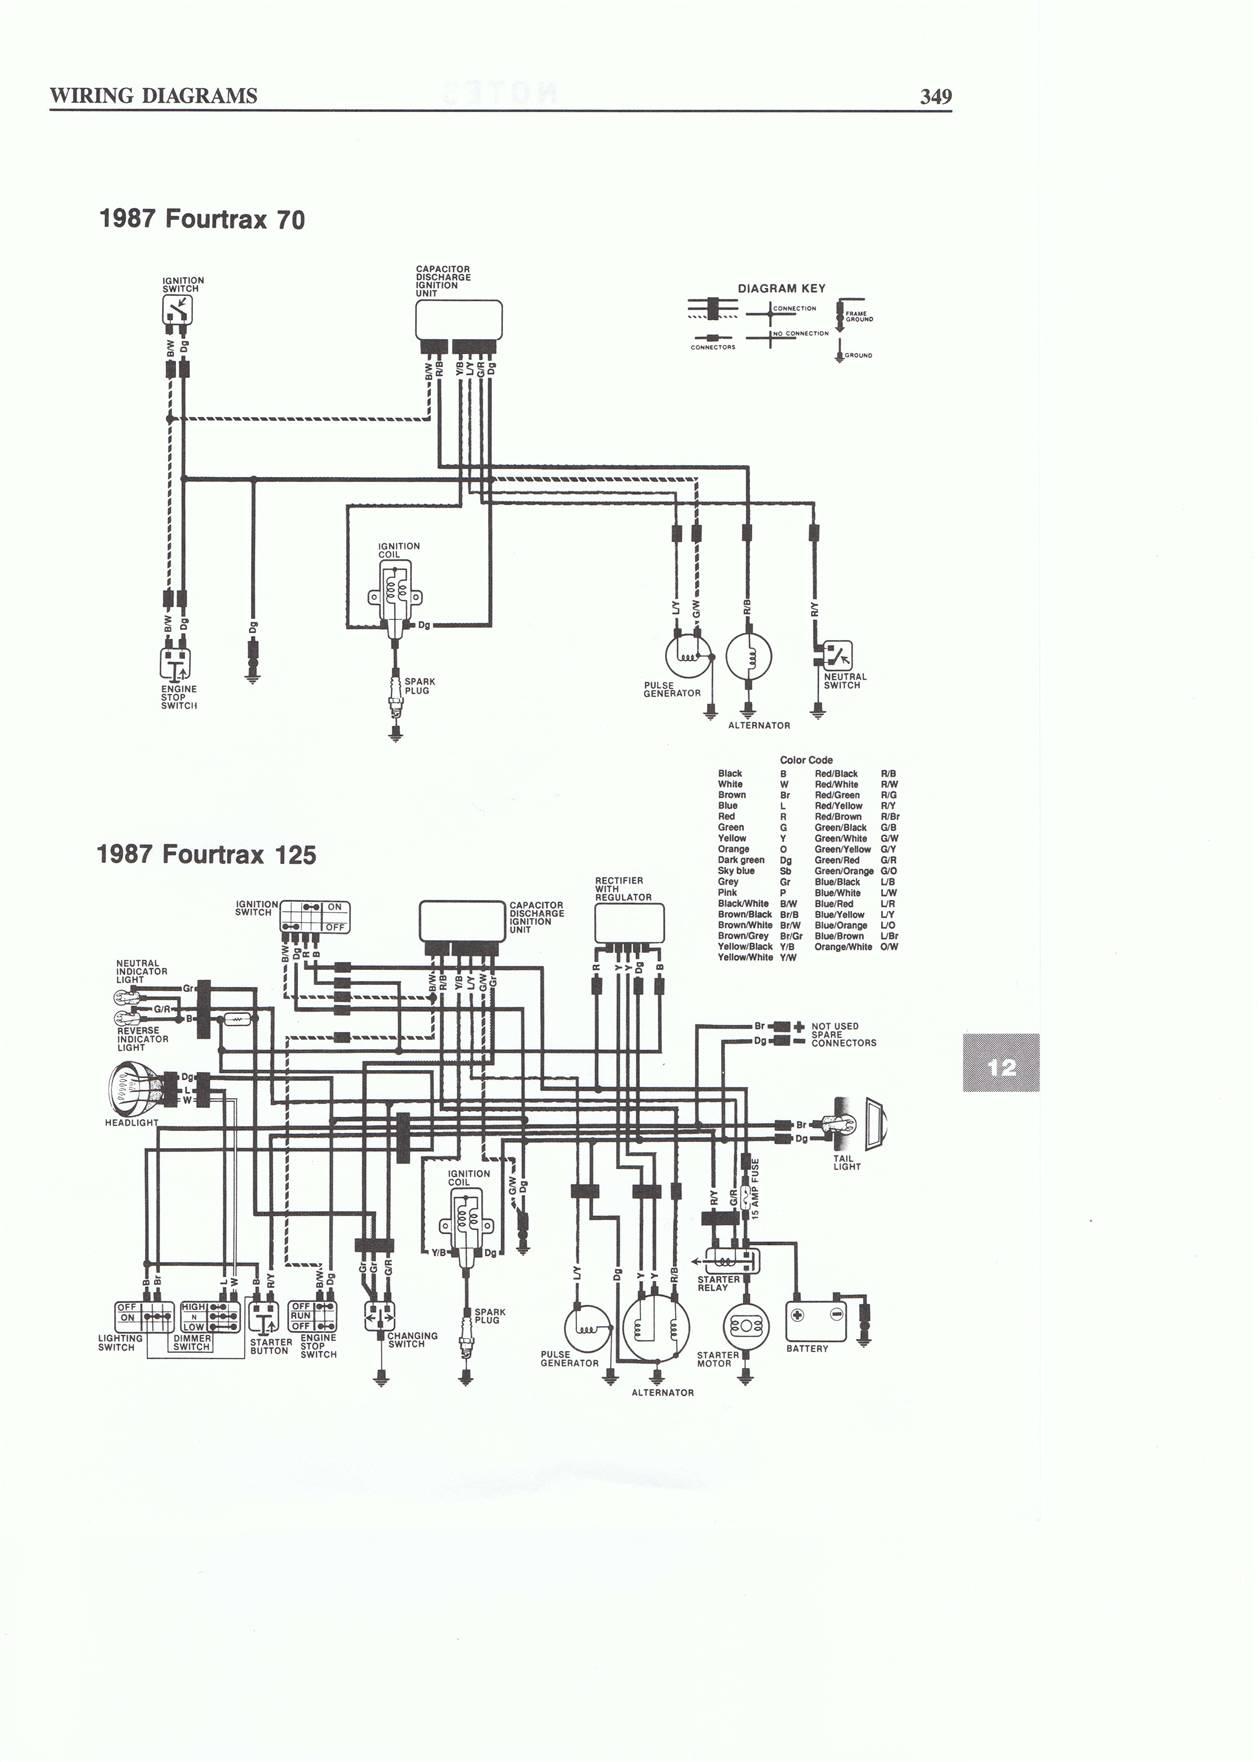 kazuma 50cc wiring diagram wiring diagrams roketa 90cc atv wiring diagram kazuma 150cc wiring diagram wiring [ 1260 x 1762 Pixel ]